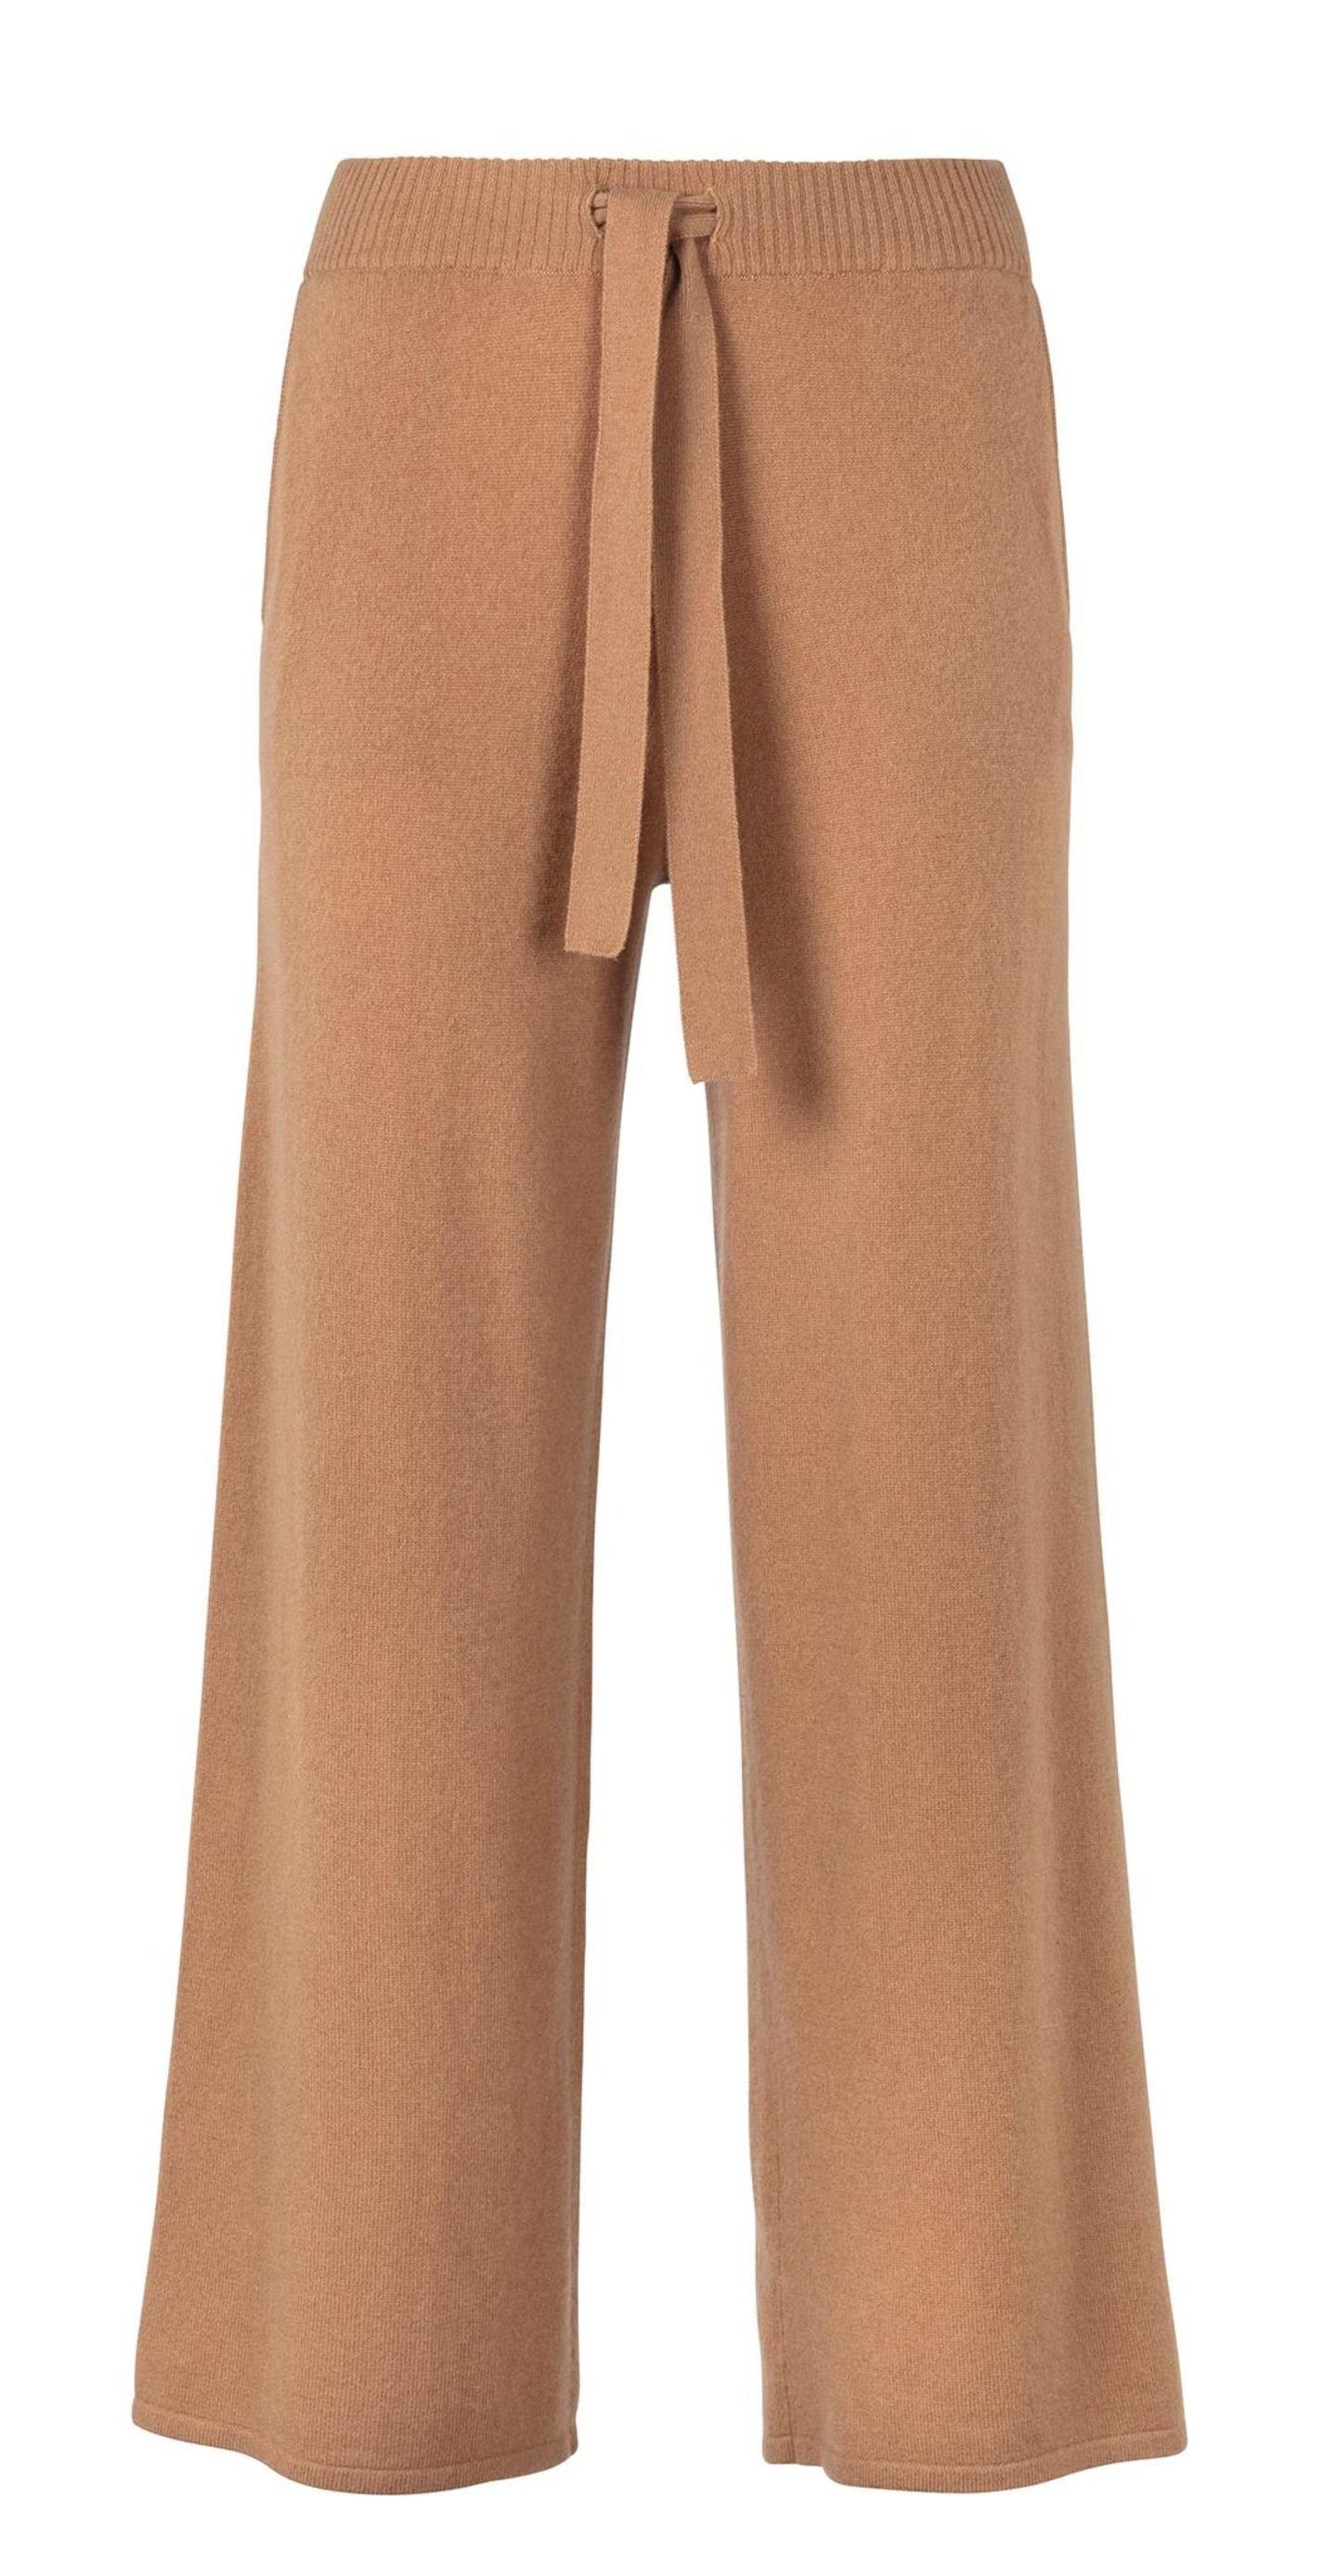 1 Style, 2 Looks: Cashmere Hose